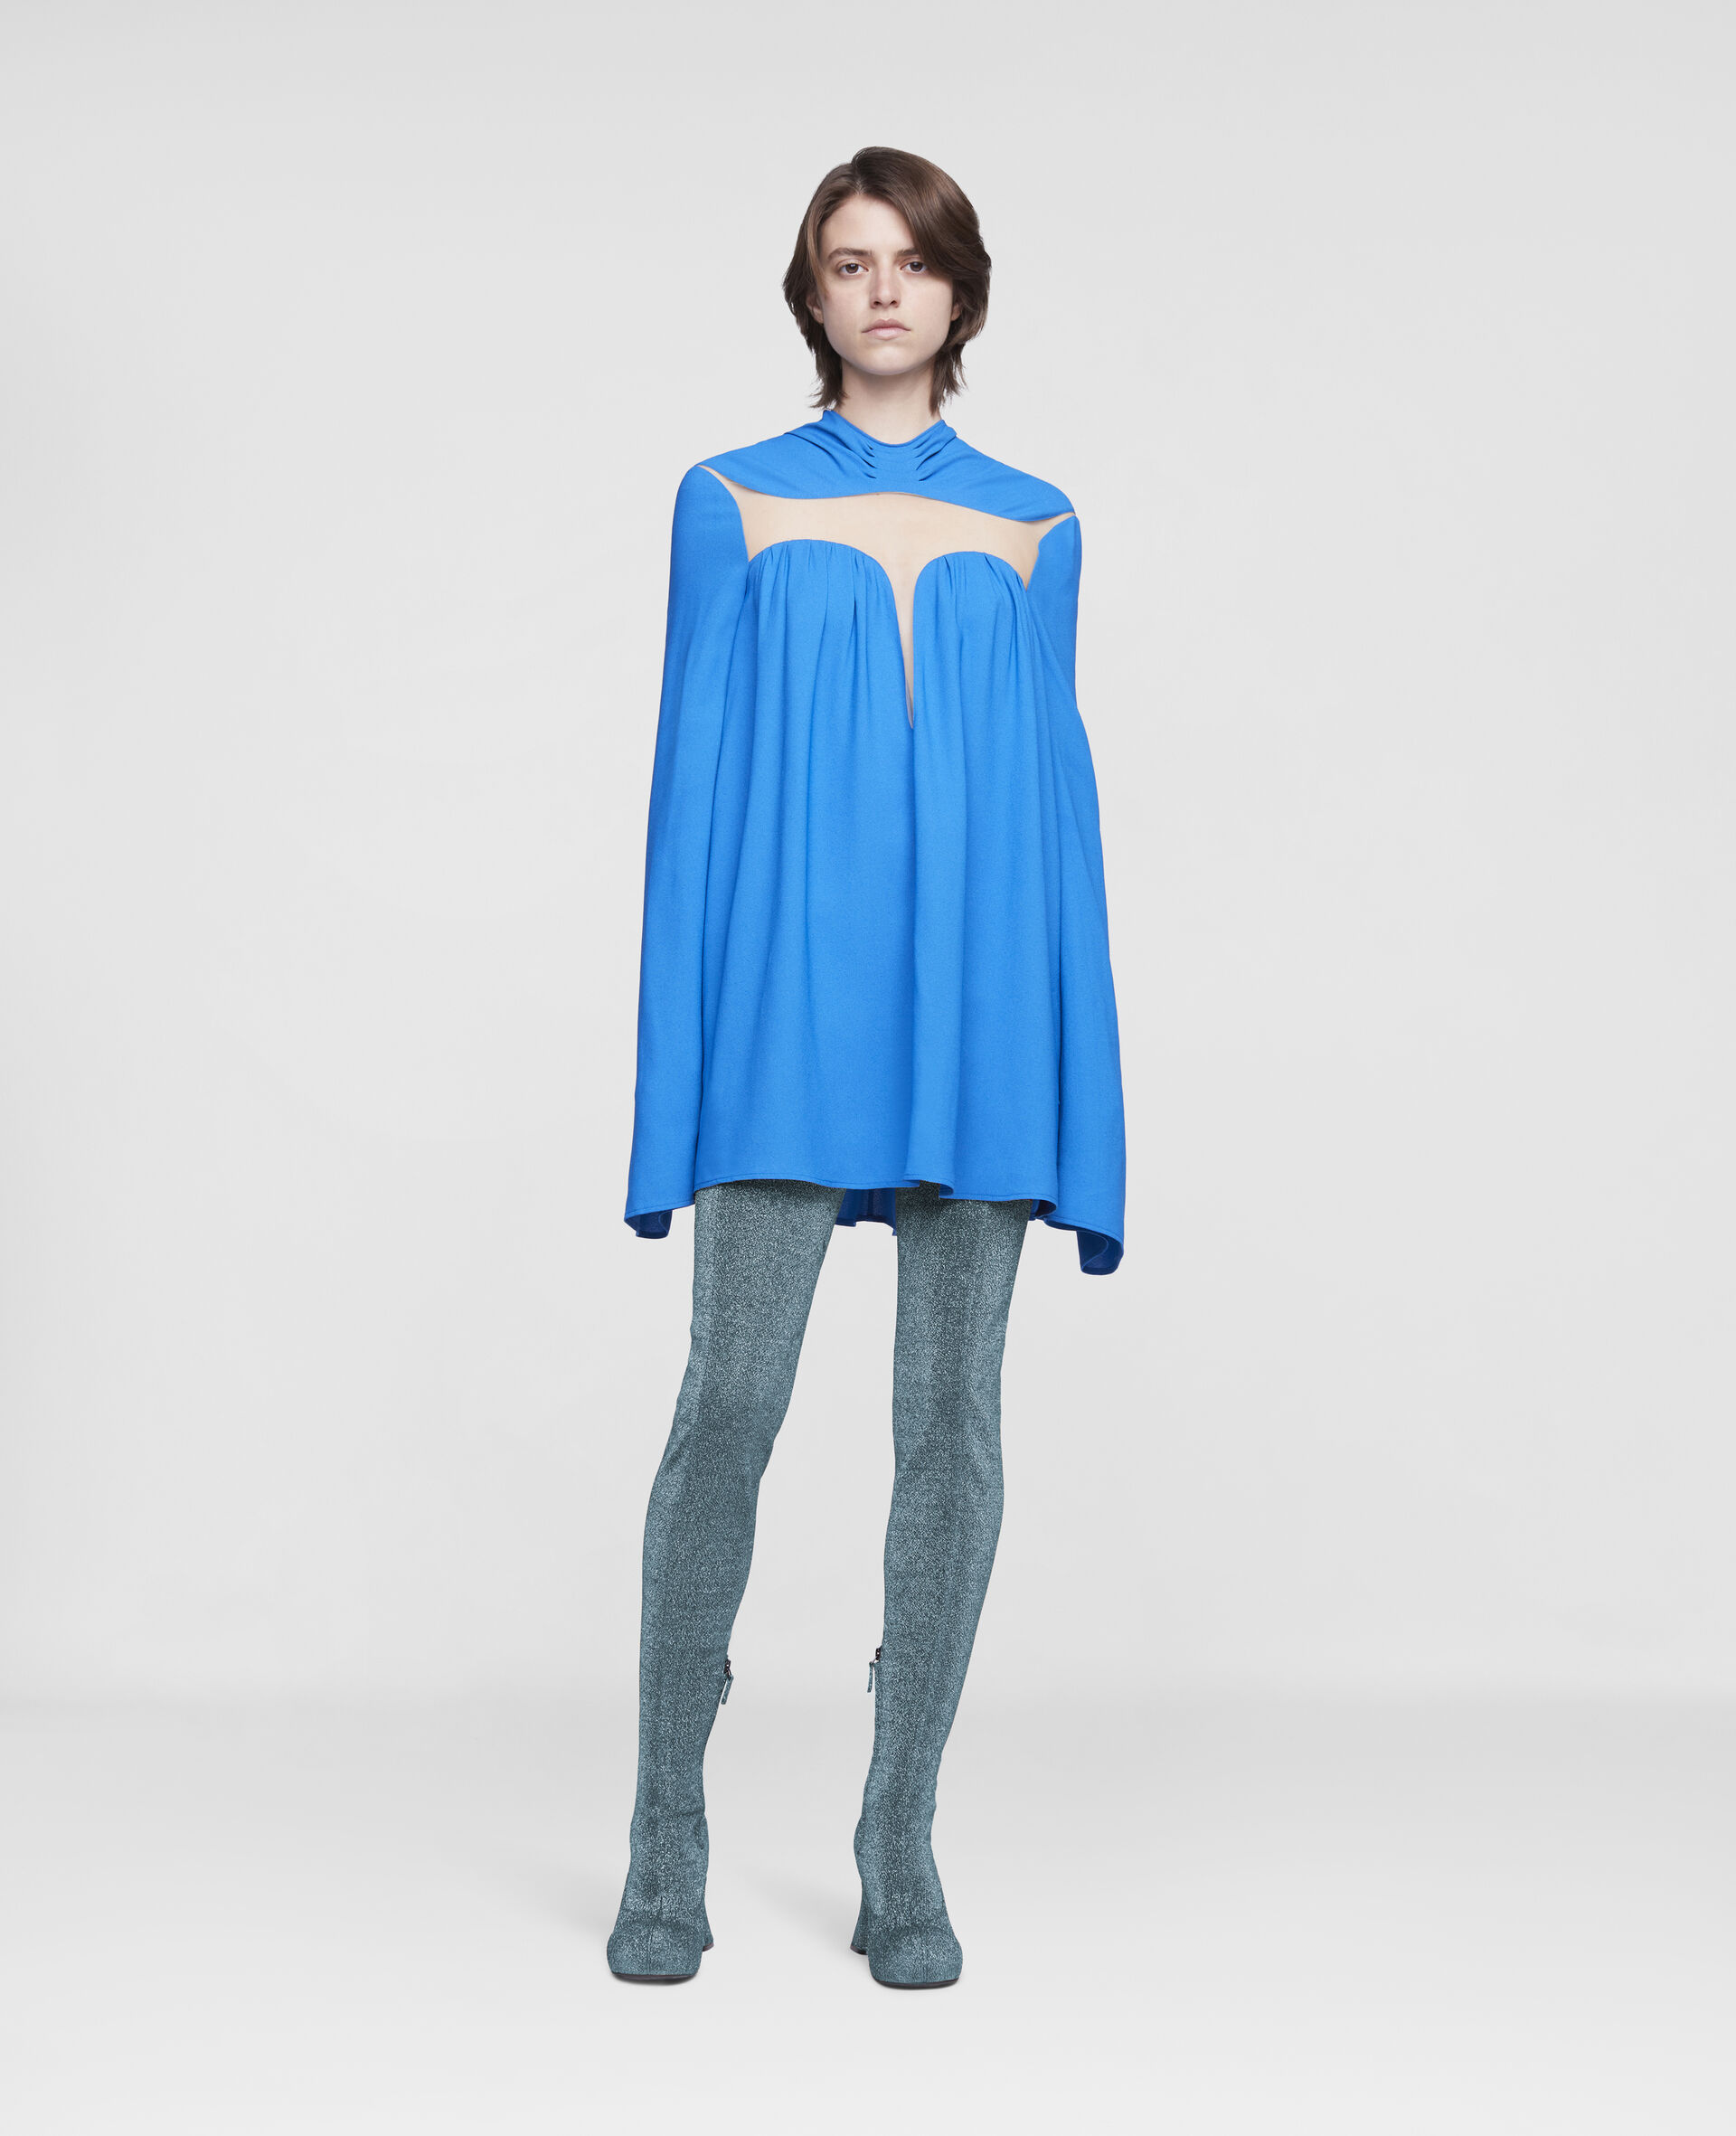 Miniabito Cordelia-Blu-large image number 1